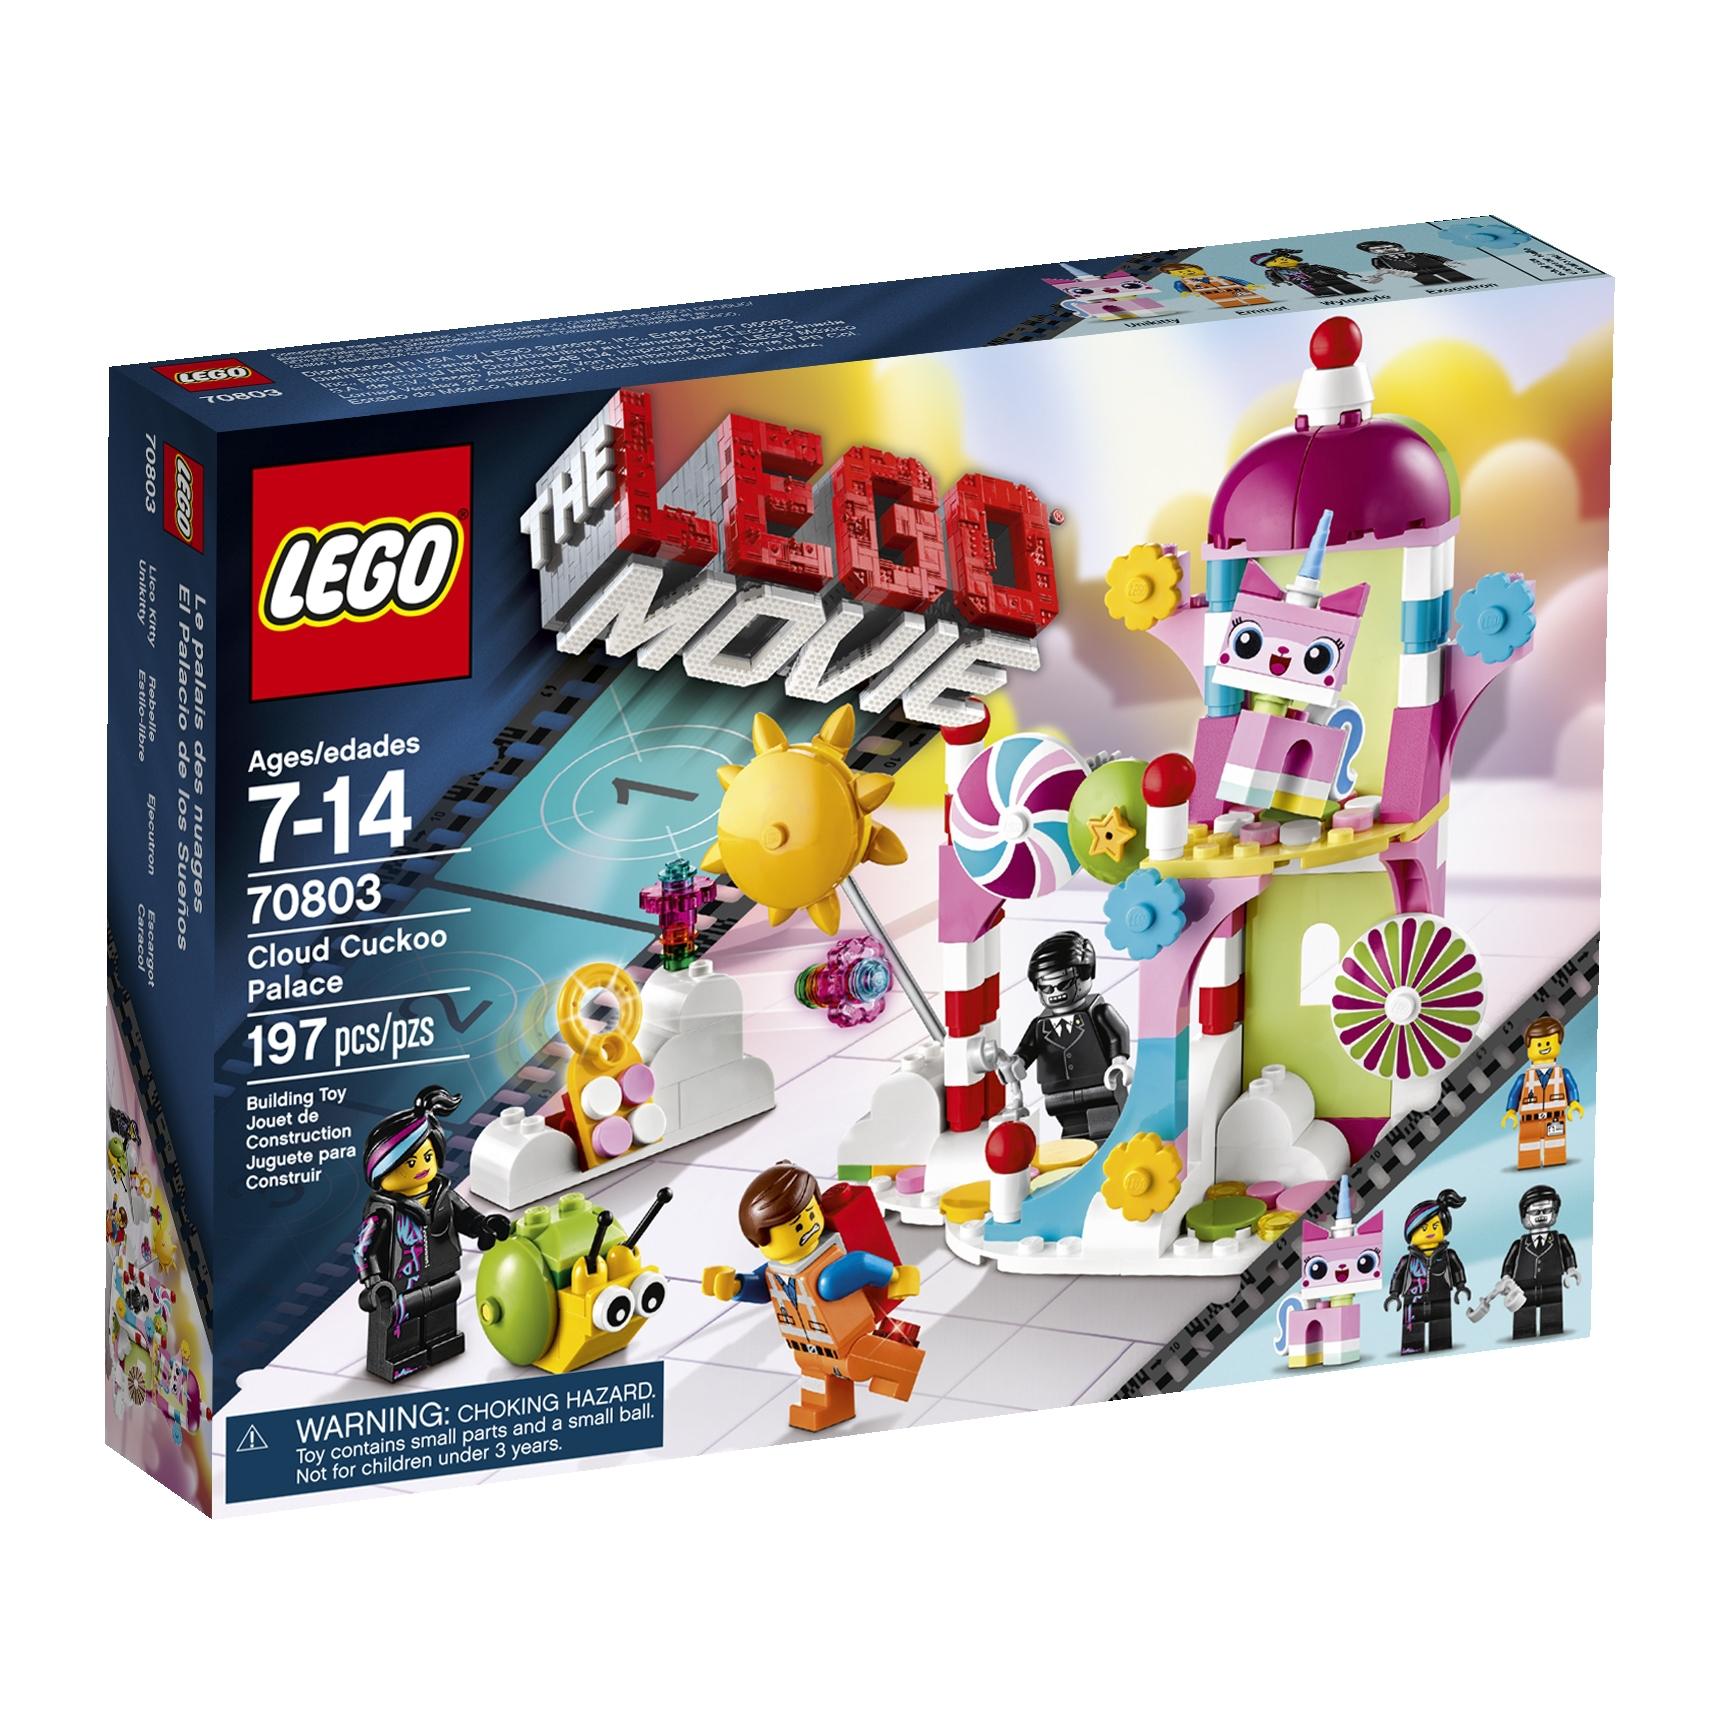 Lego Movie Toys : Cloud cuckoo palace brickipedia fandom powered